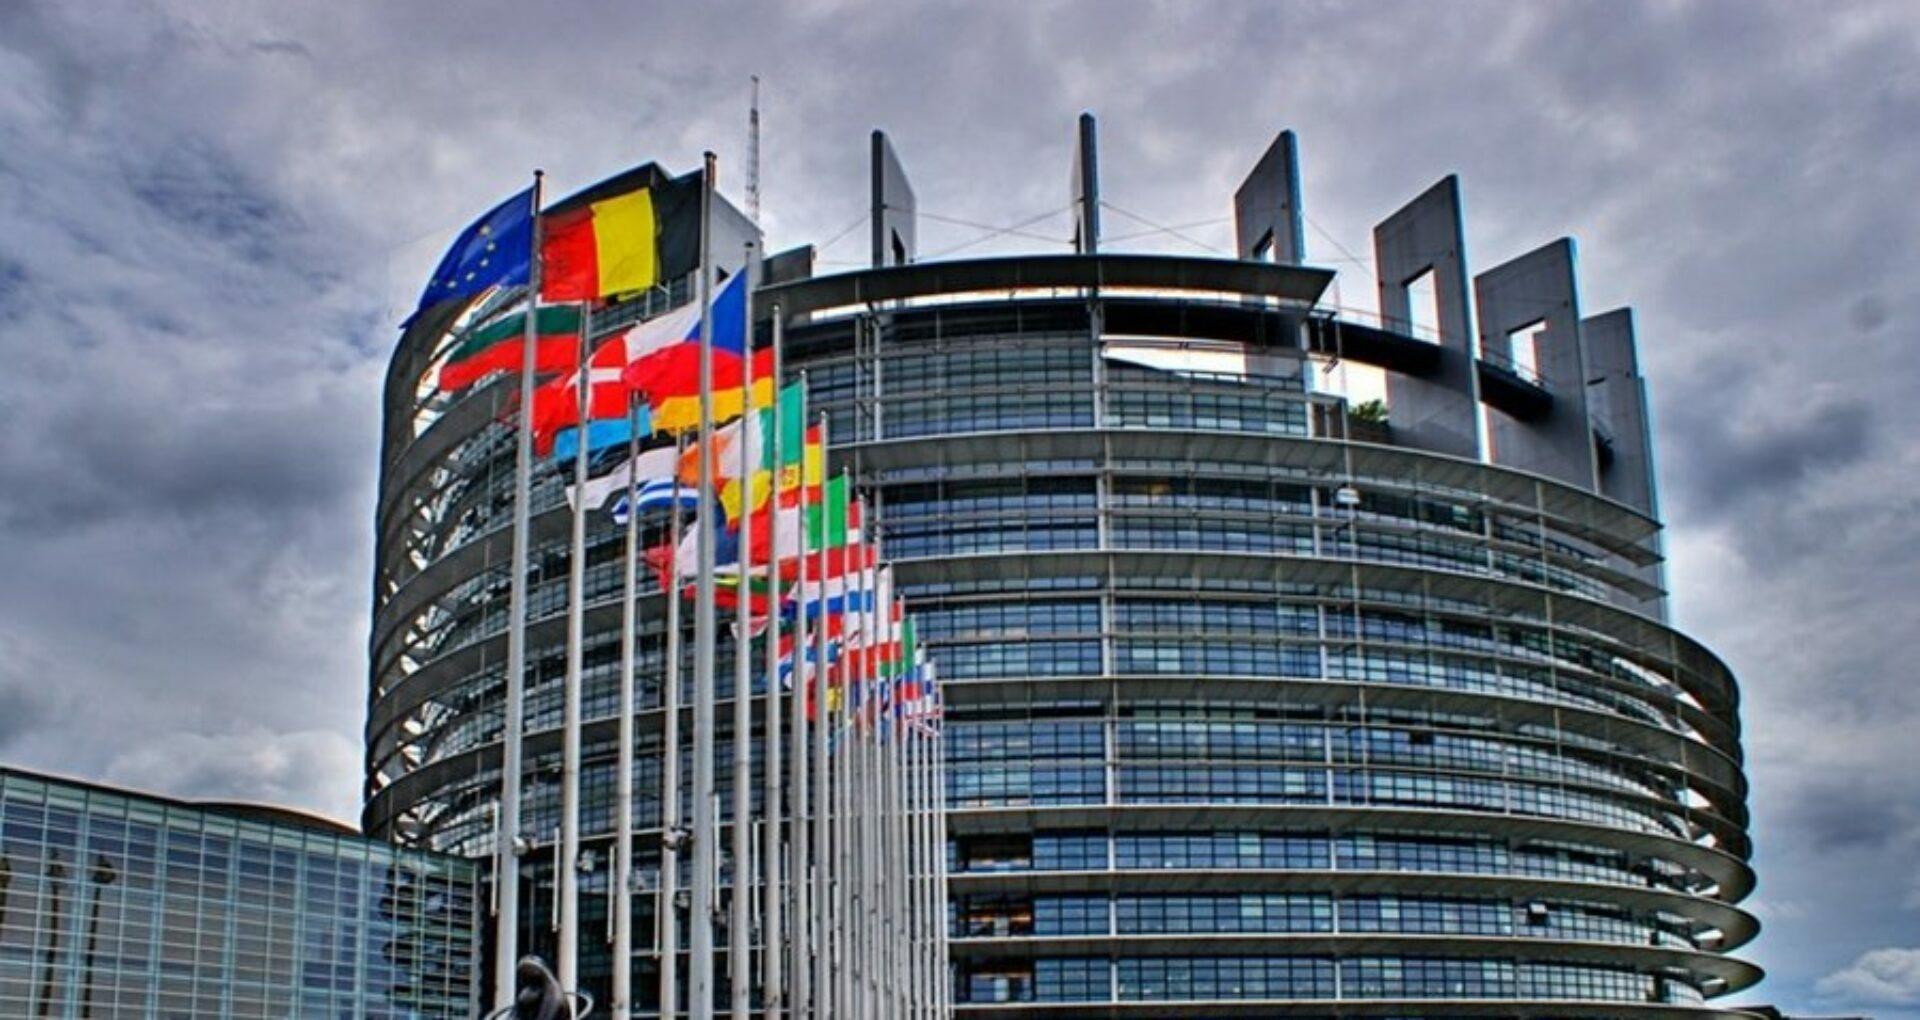 The European Union Warns Moldova Against Propaganda Messages